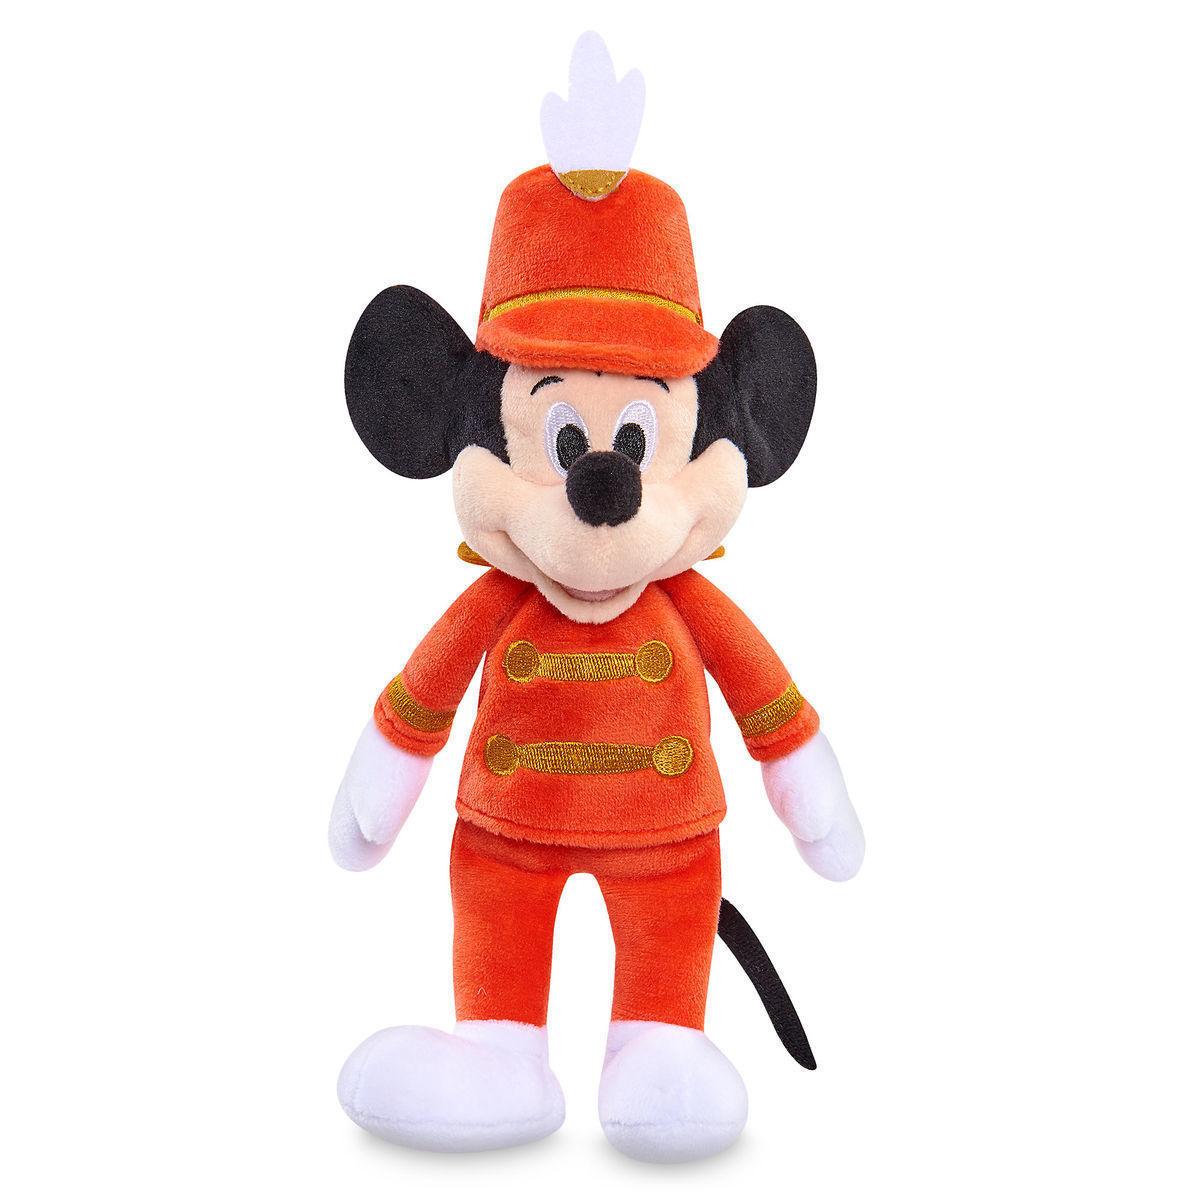 Disney Mickey The True Original Plush Set Mickey Through the Years Small New